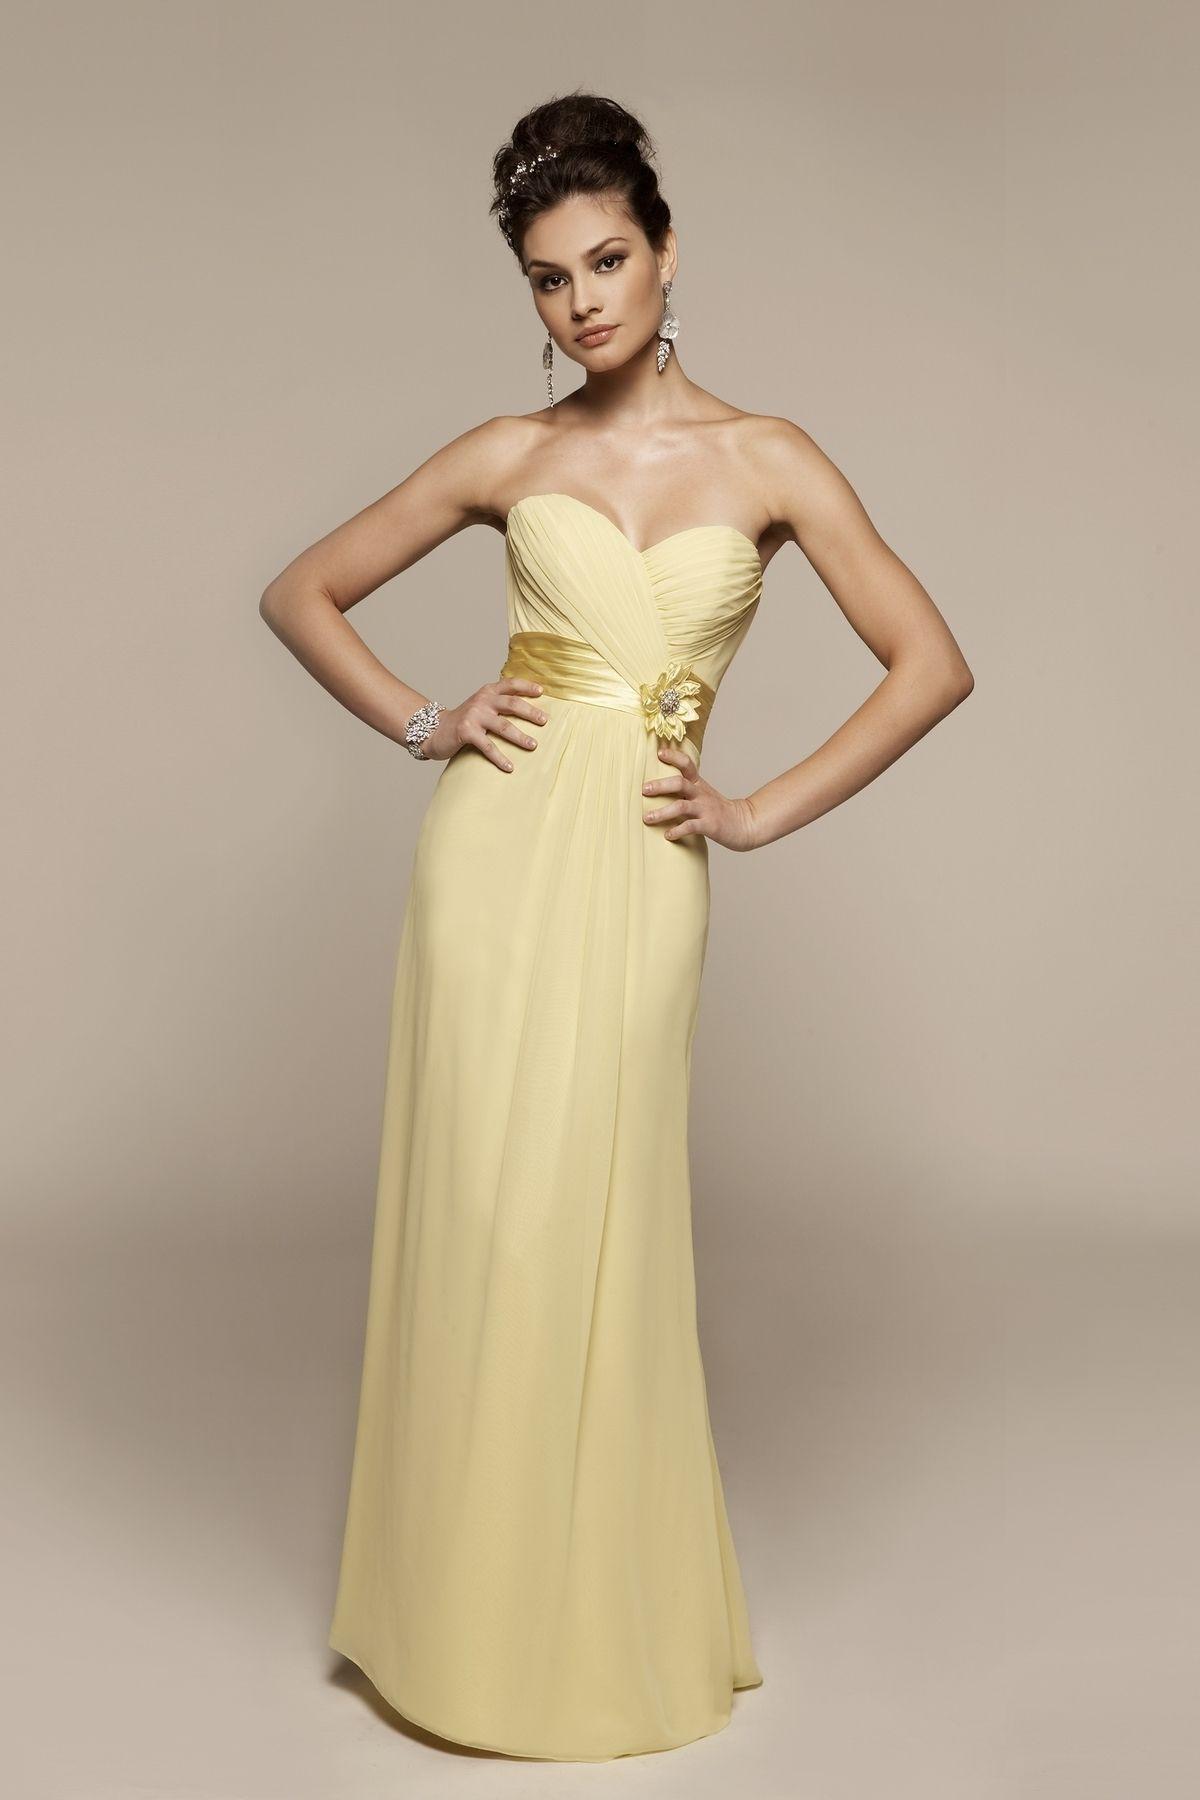 Sweetheart chiffon dress with natural wedding inspiration